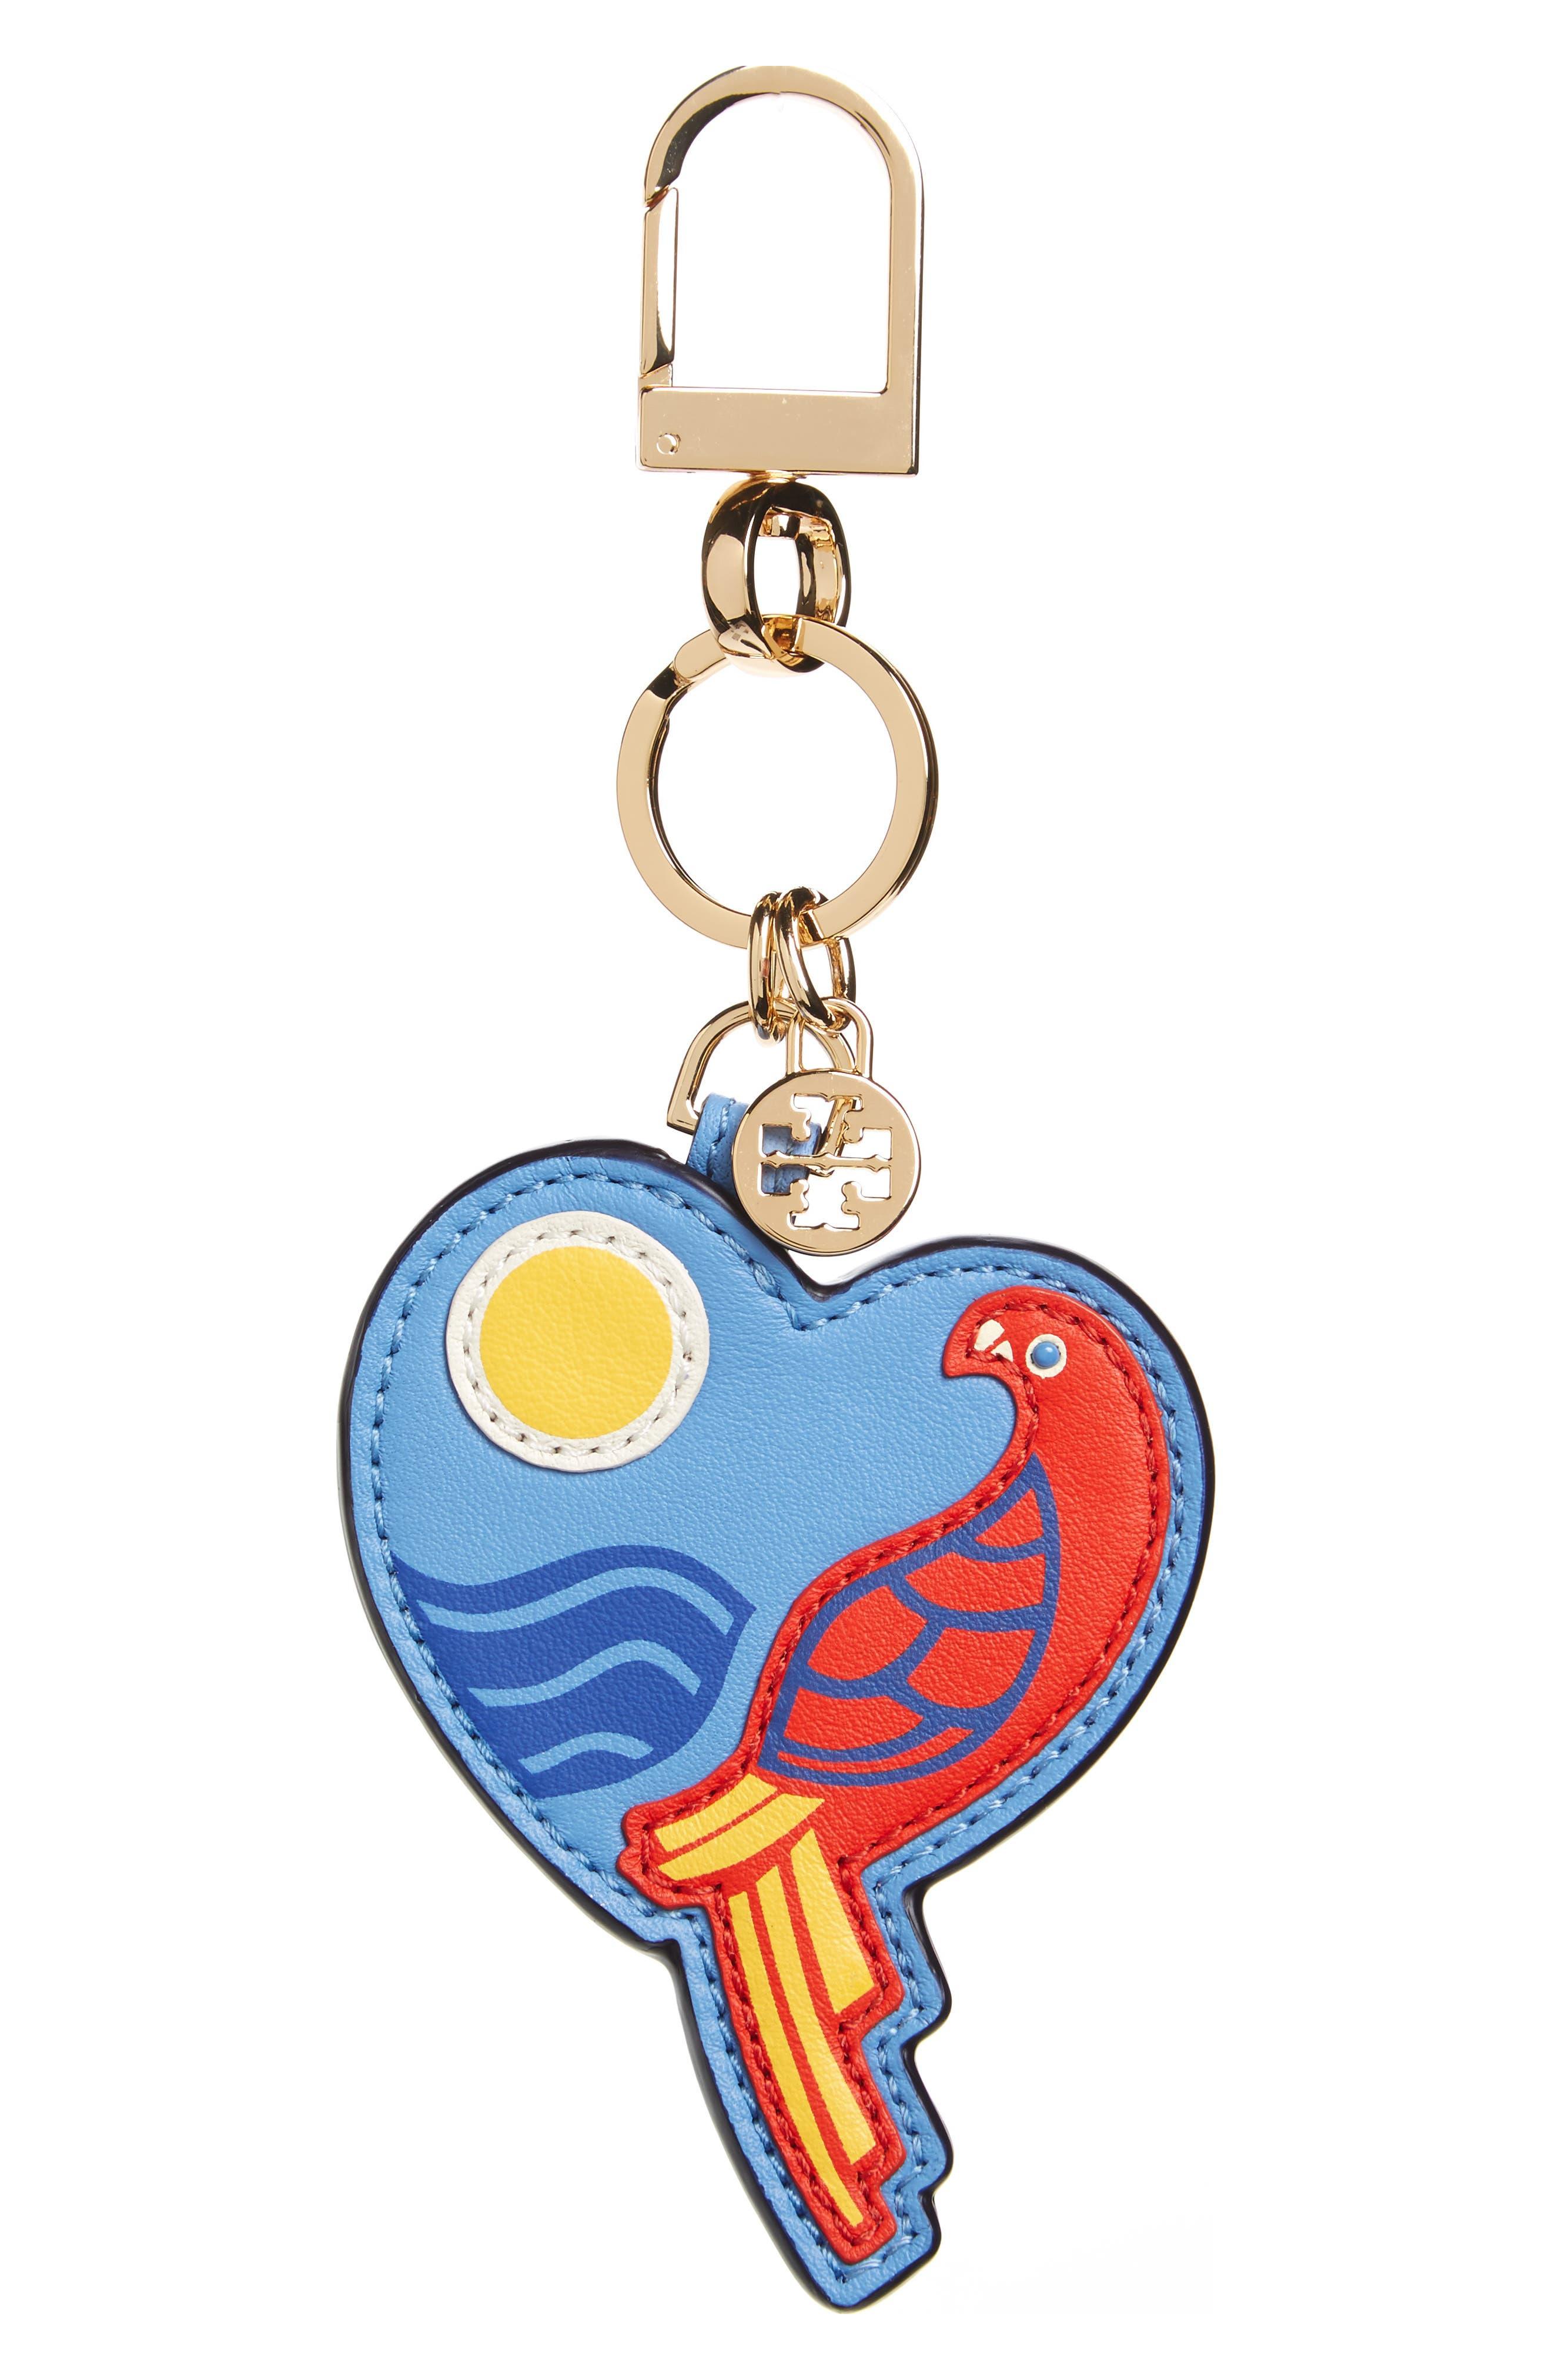 TORY BURCH Parrot Heart Bag Charm